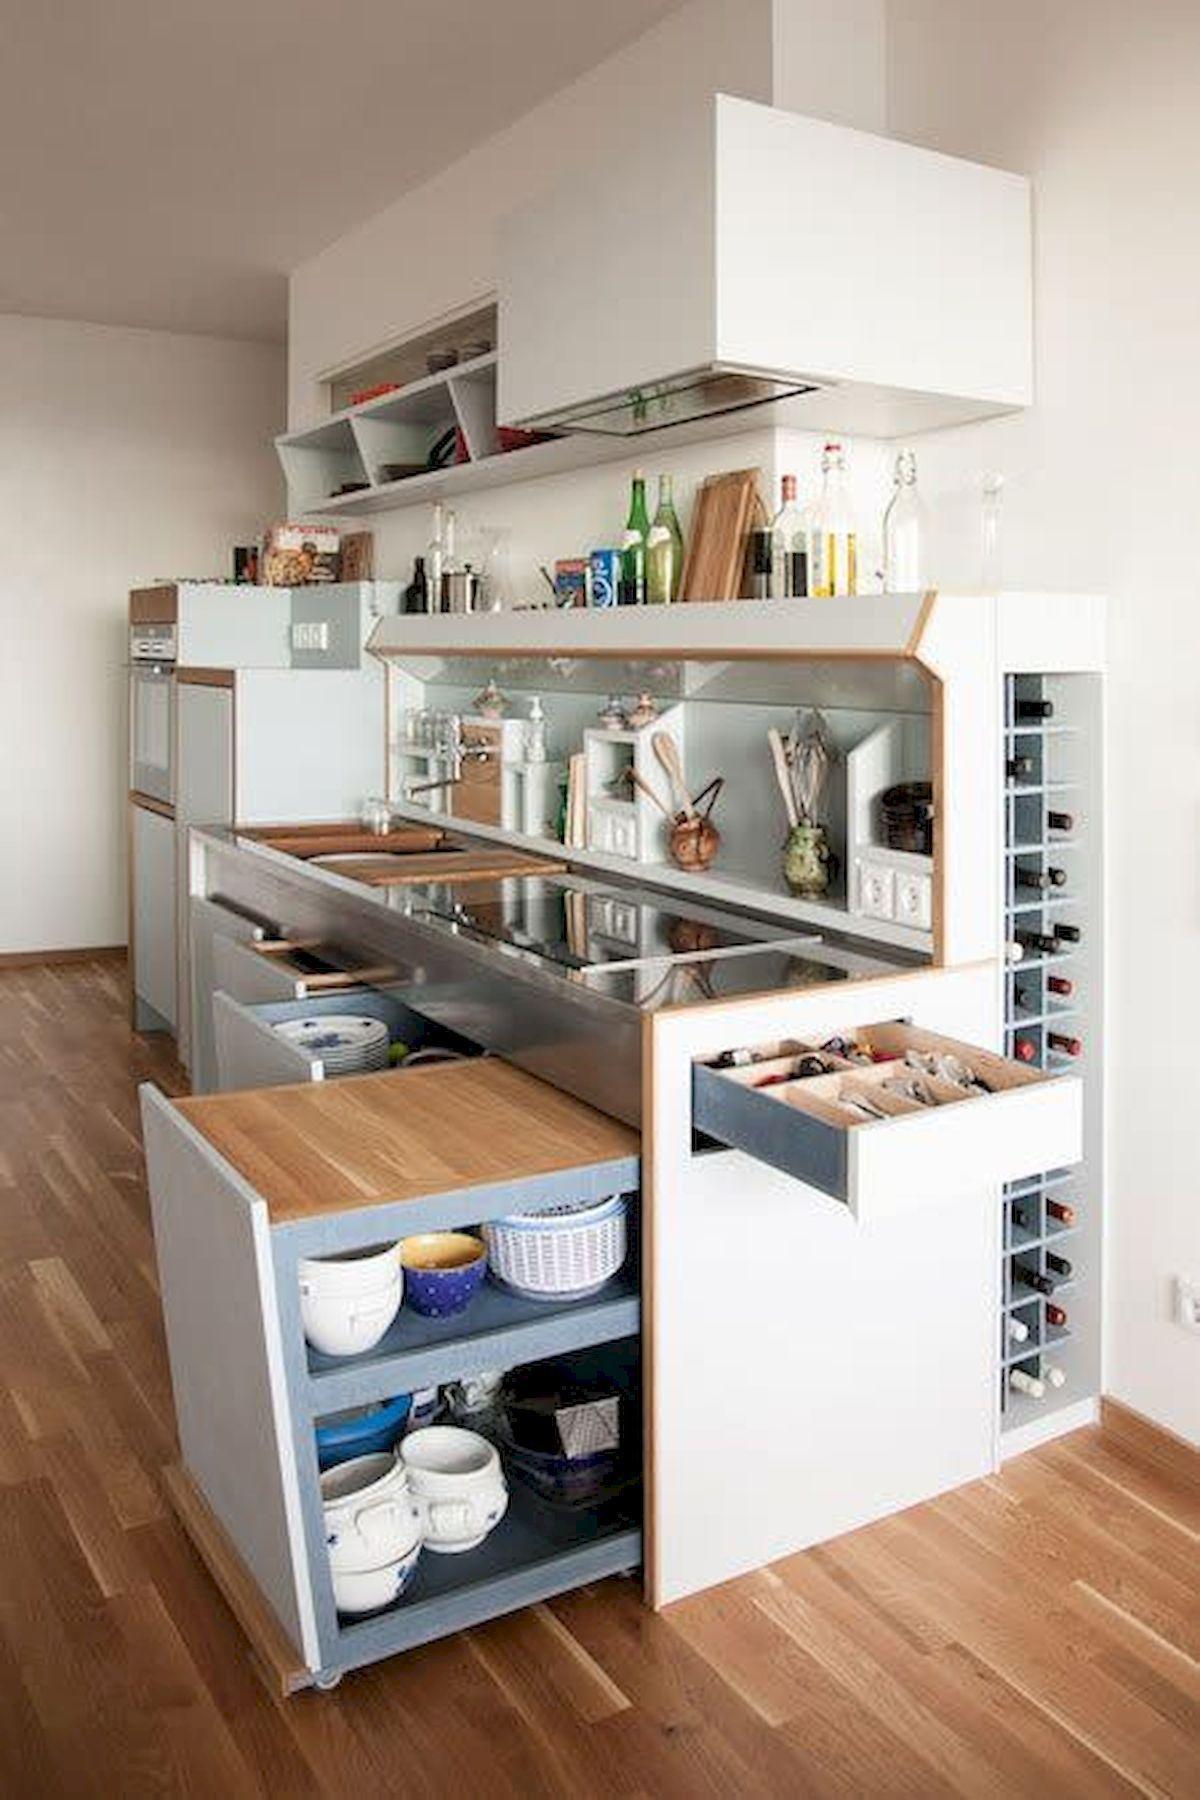 50 Best Small Kitchen Design Ideas And Decor 2 Diykitchenshelves Kitchen Design Small Kitchen Remodel Small Interior Design Kitchen